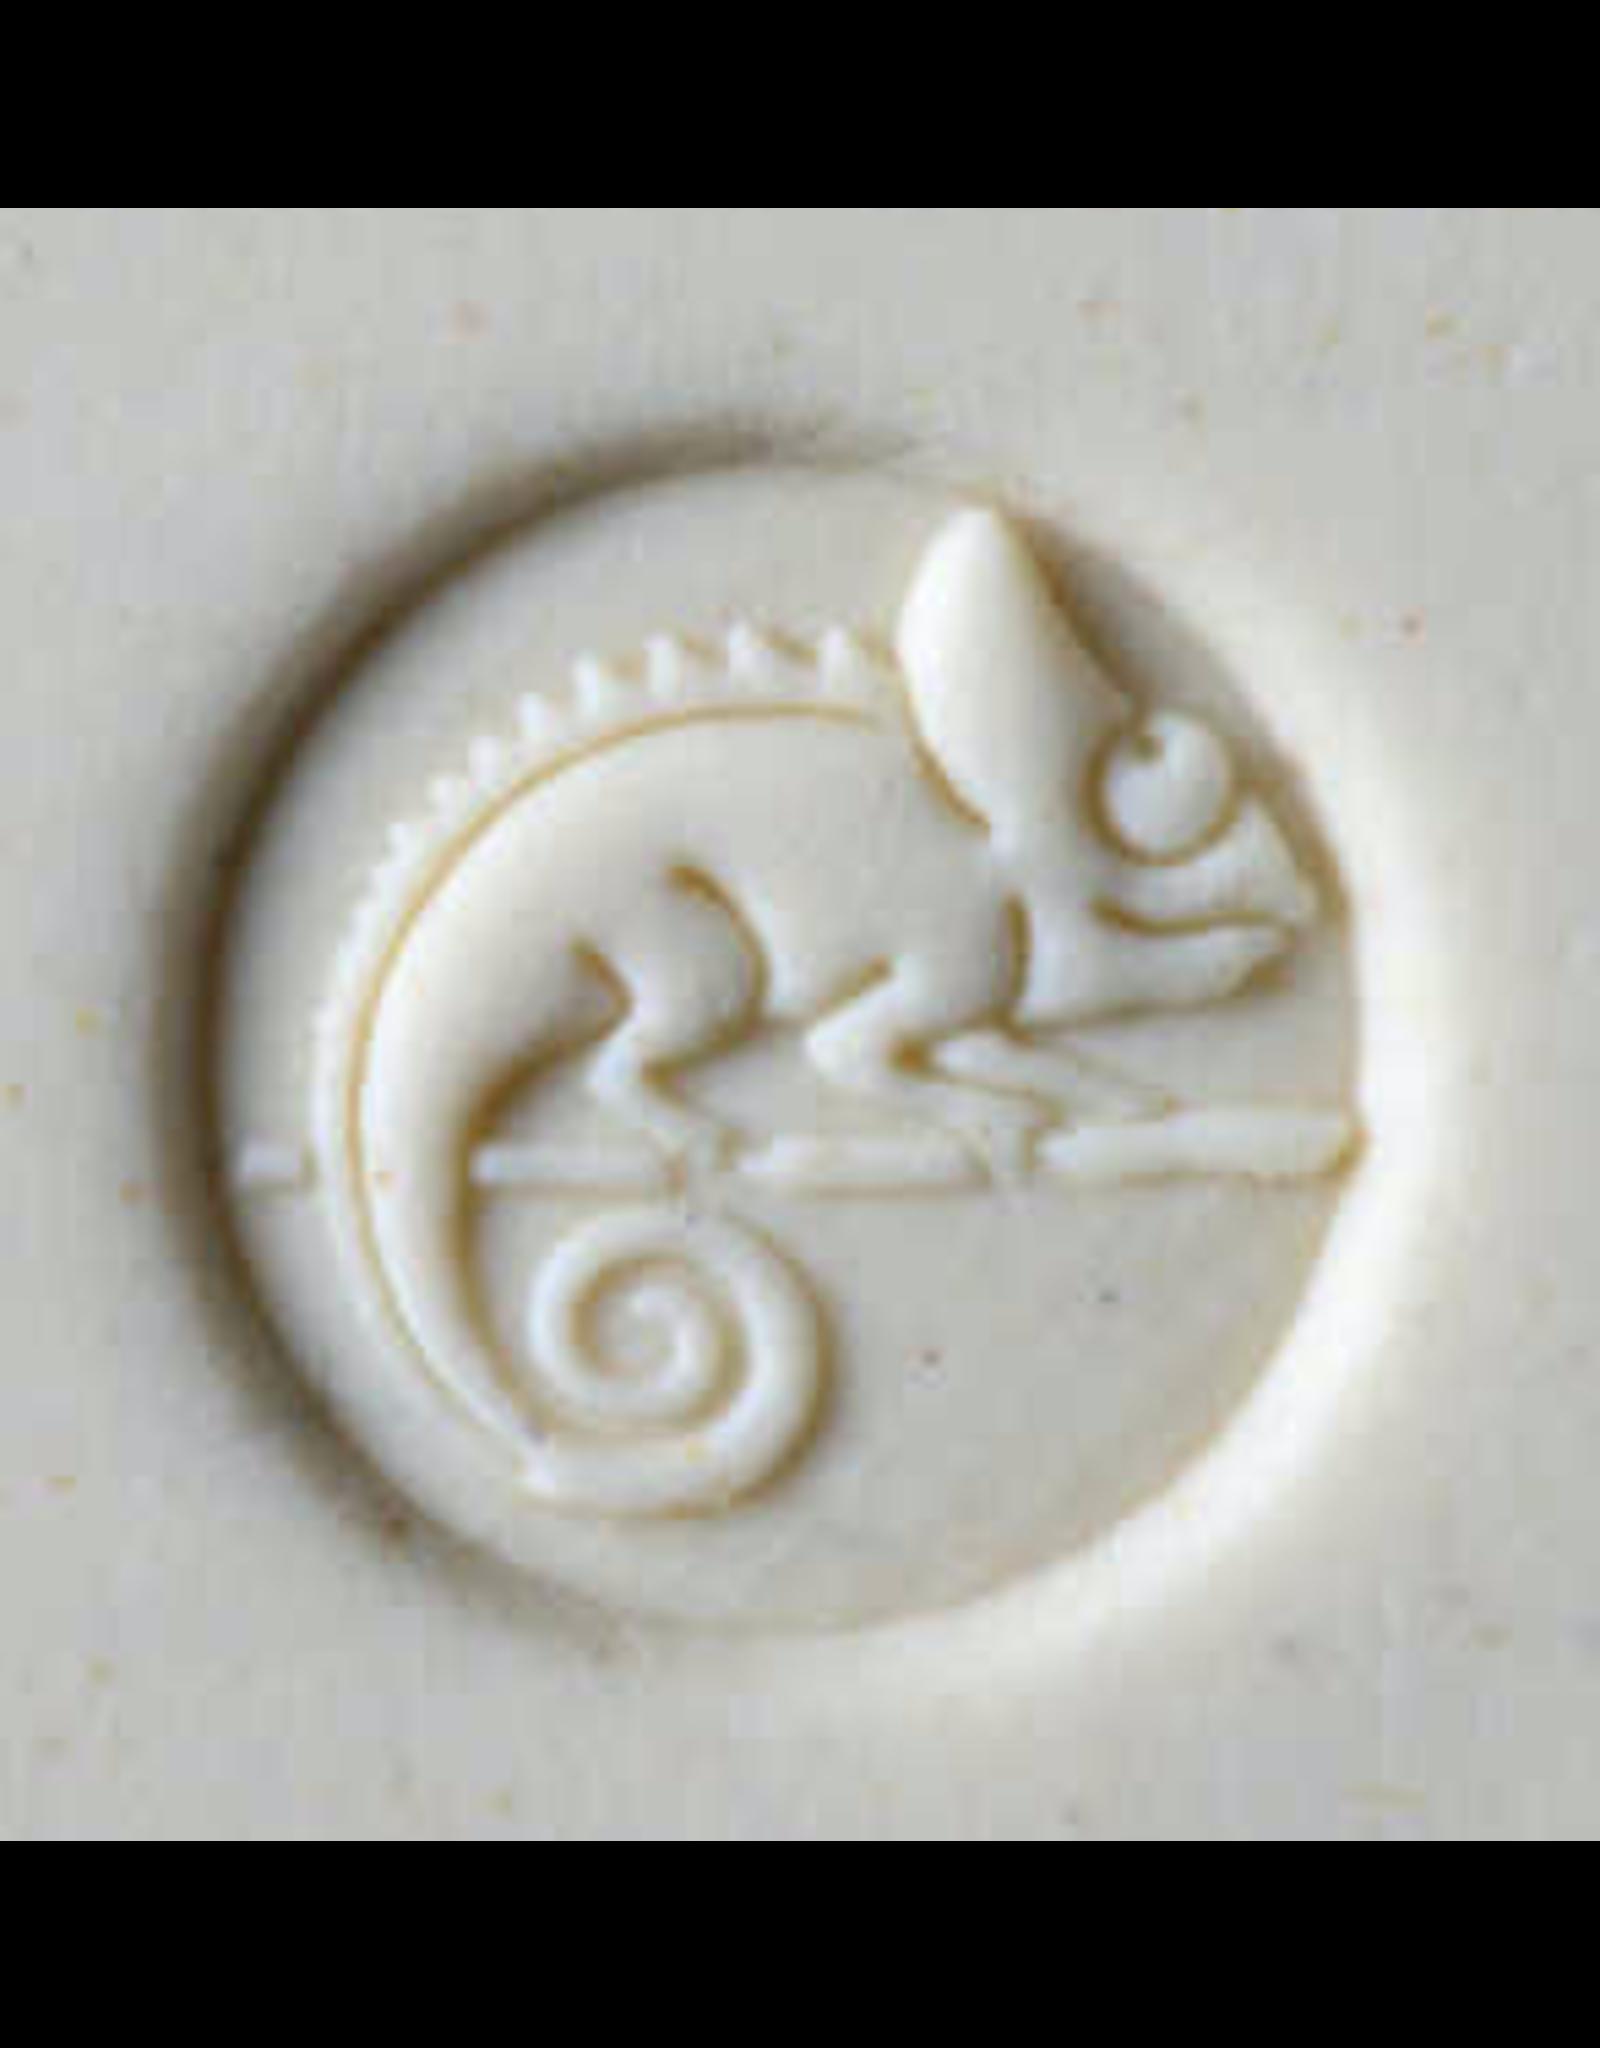 Chameleon on Branch Stamp (1.5cm)